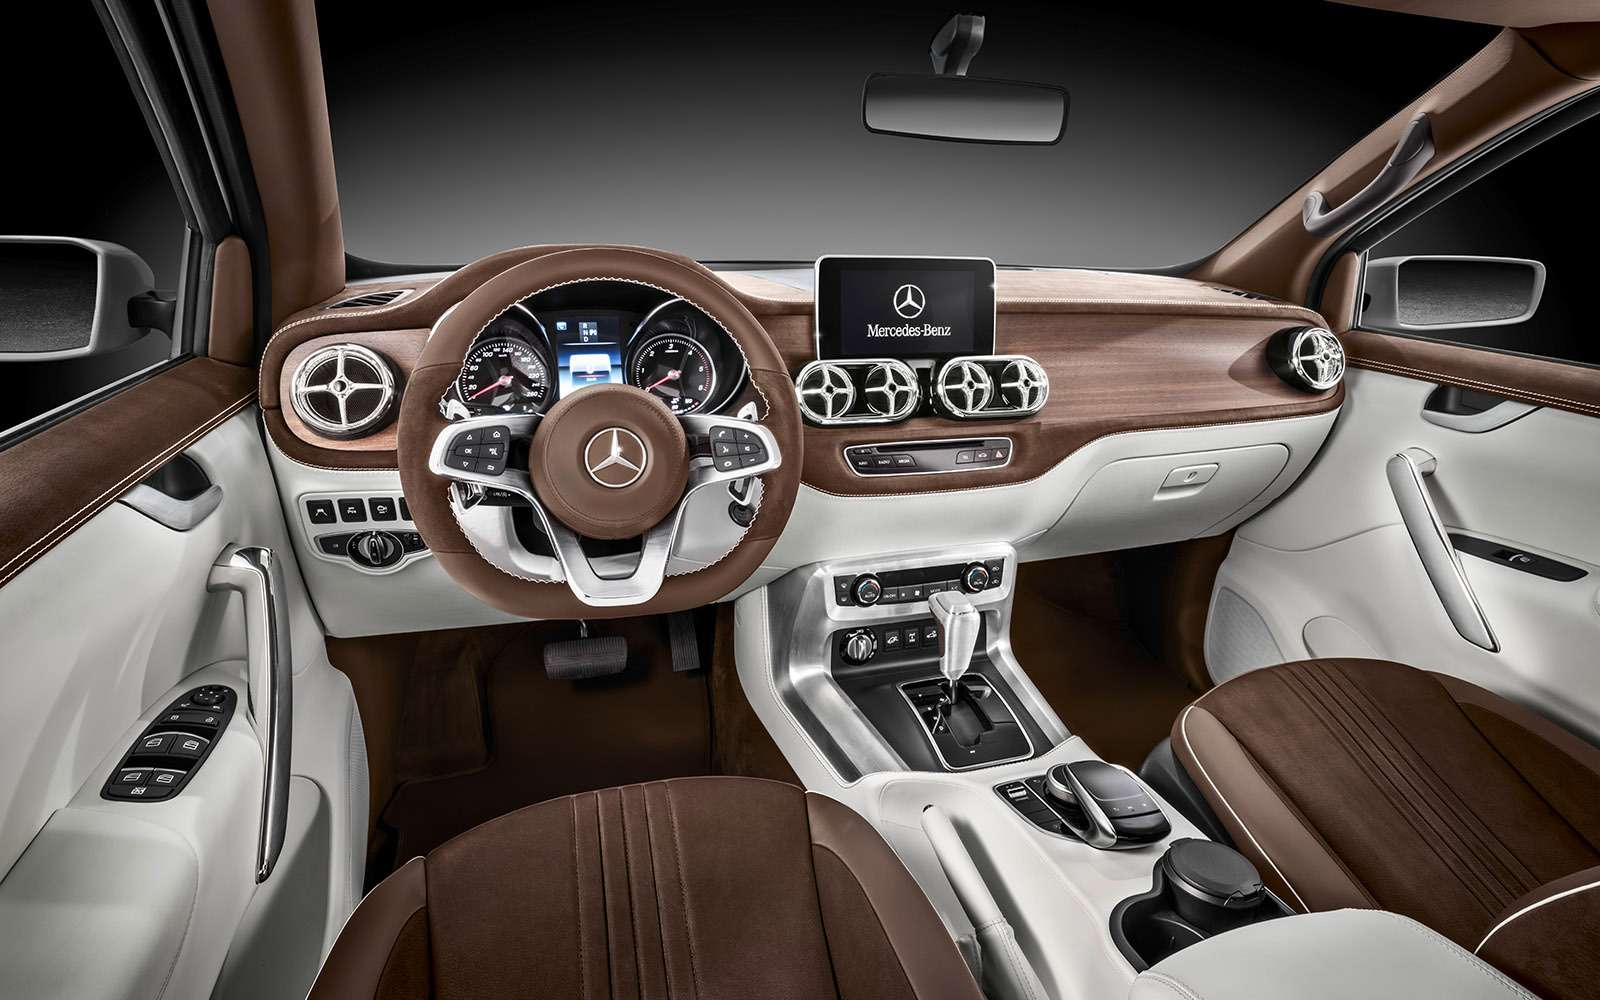 Mercedes-Benz X-класса: издеревенщины вофранты— фото 670503